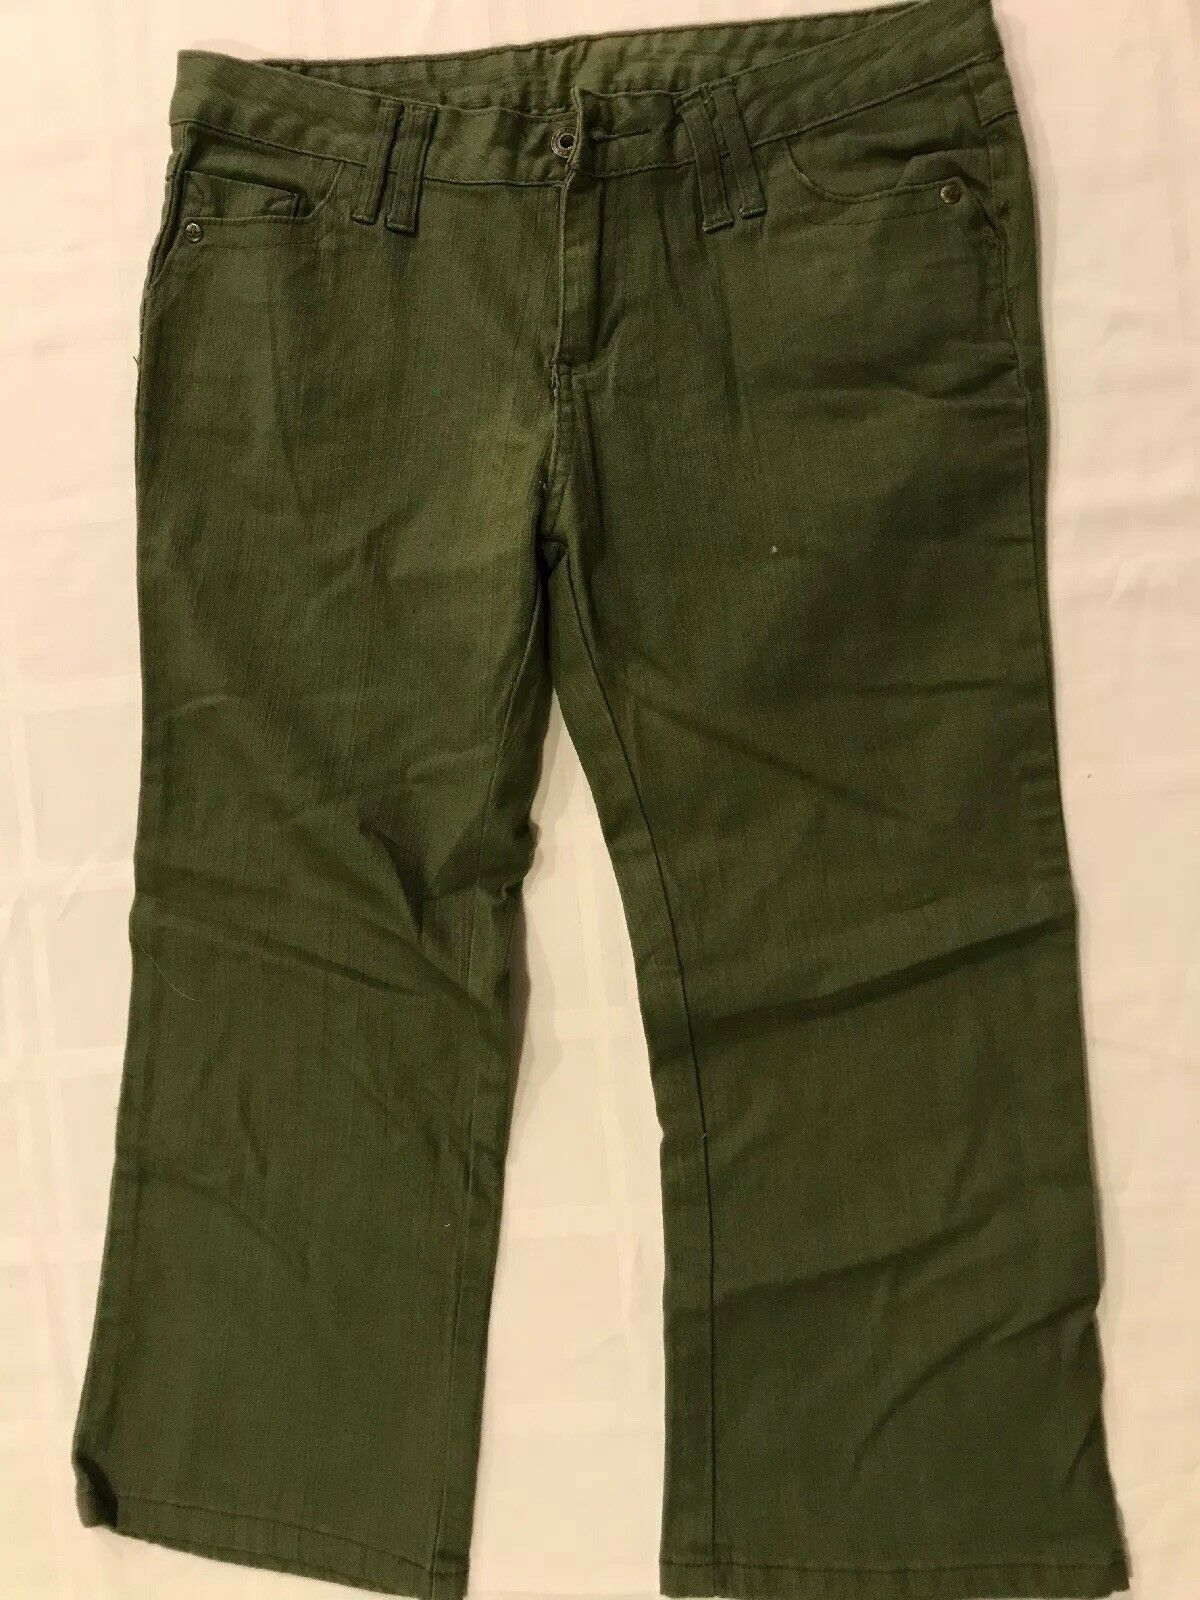 PrAna Womens Sz 6 Green Capri Cropped Pants Stretch Low Rise TS8